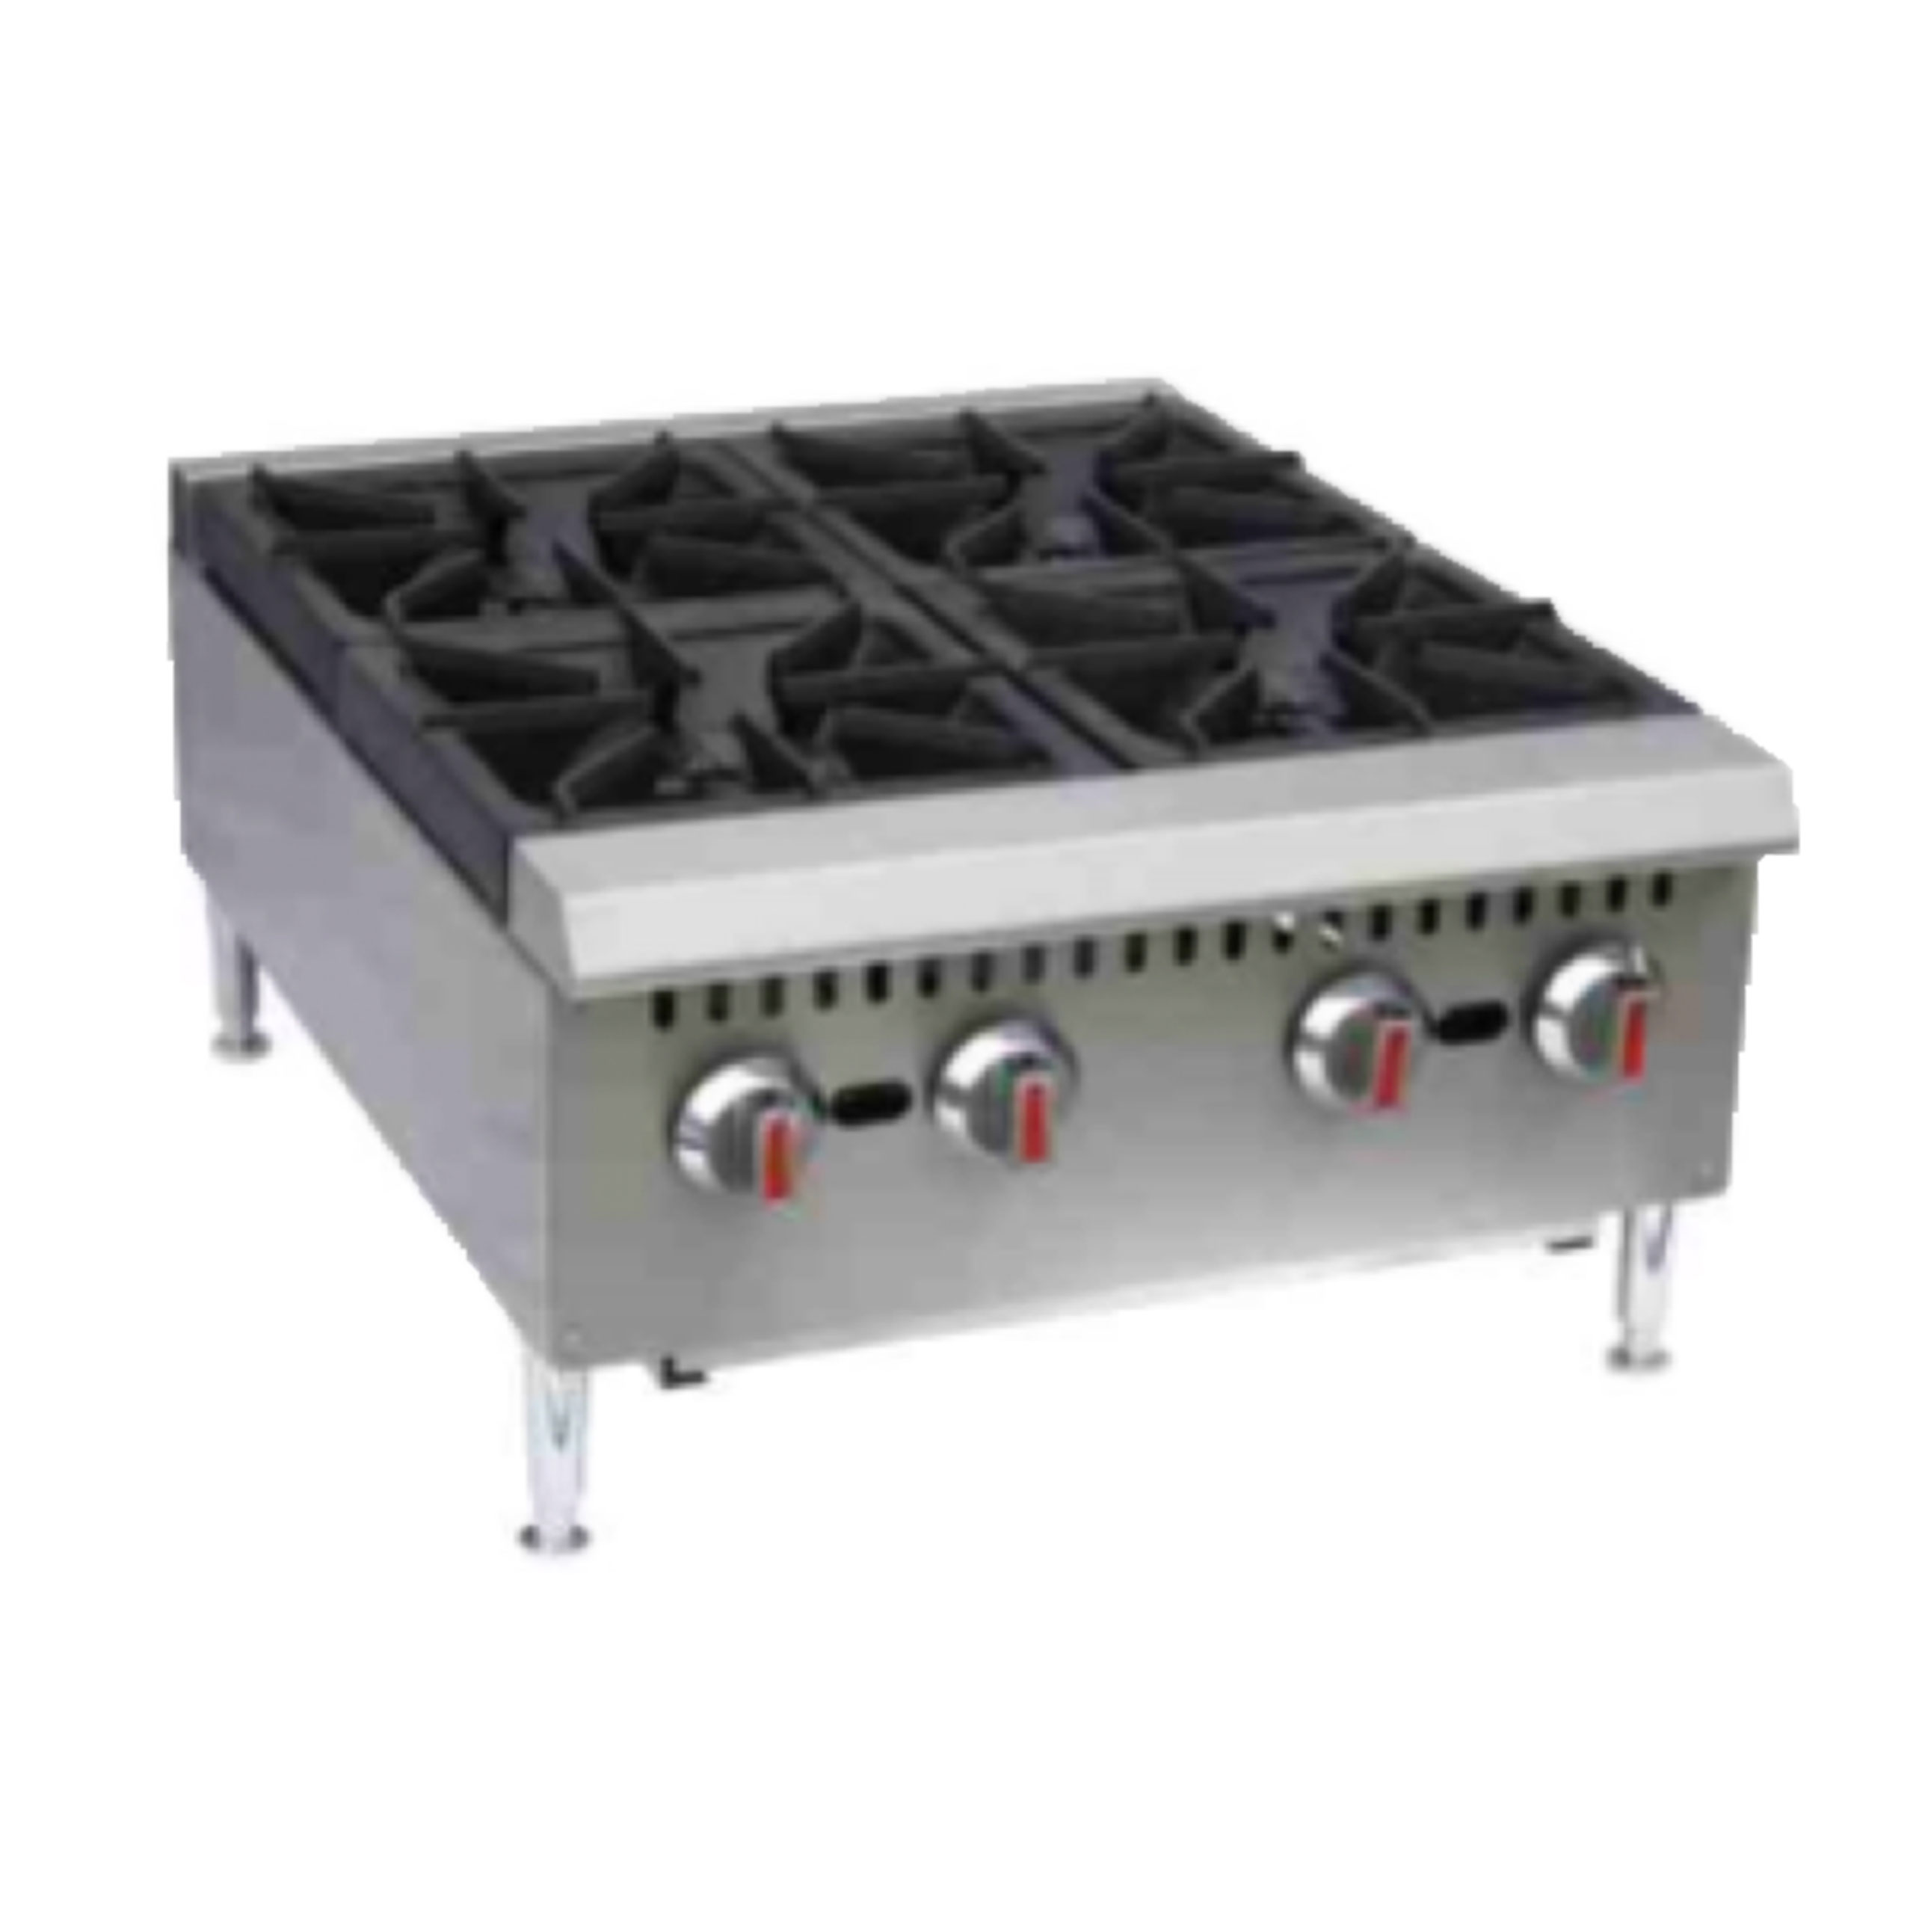 Serv-Ware SHPS-24 hotplate, countertop, gas